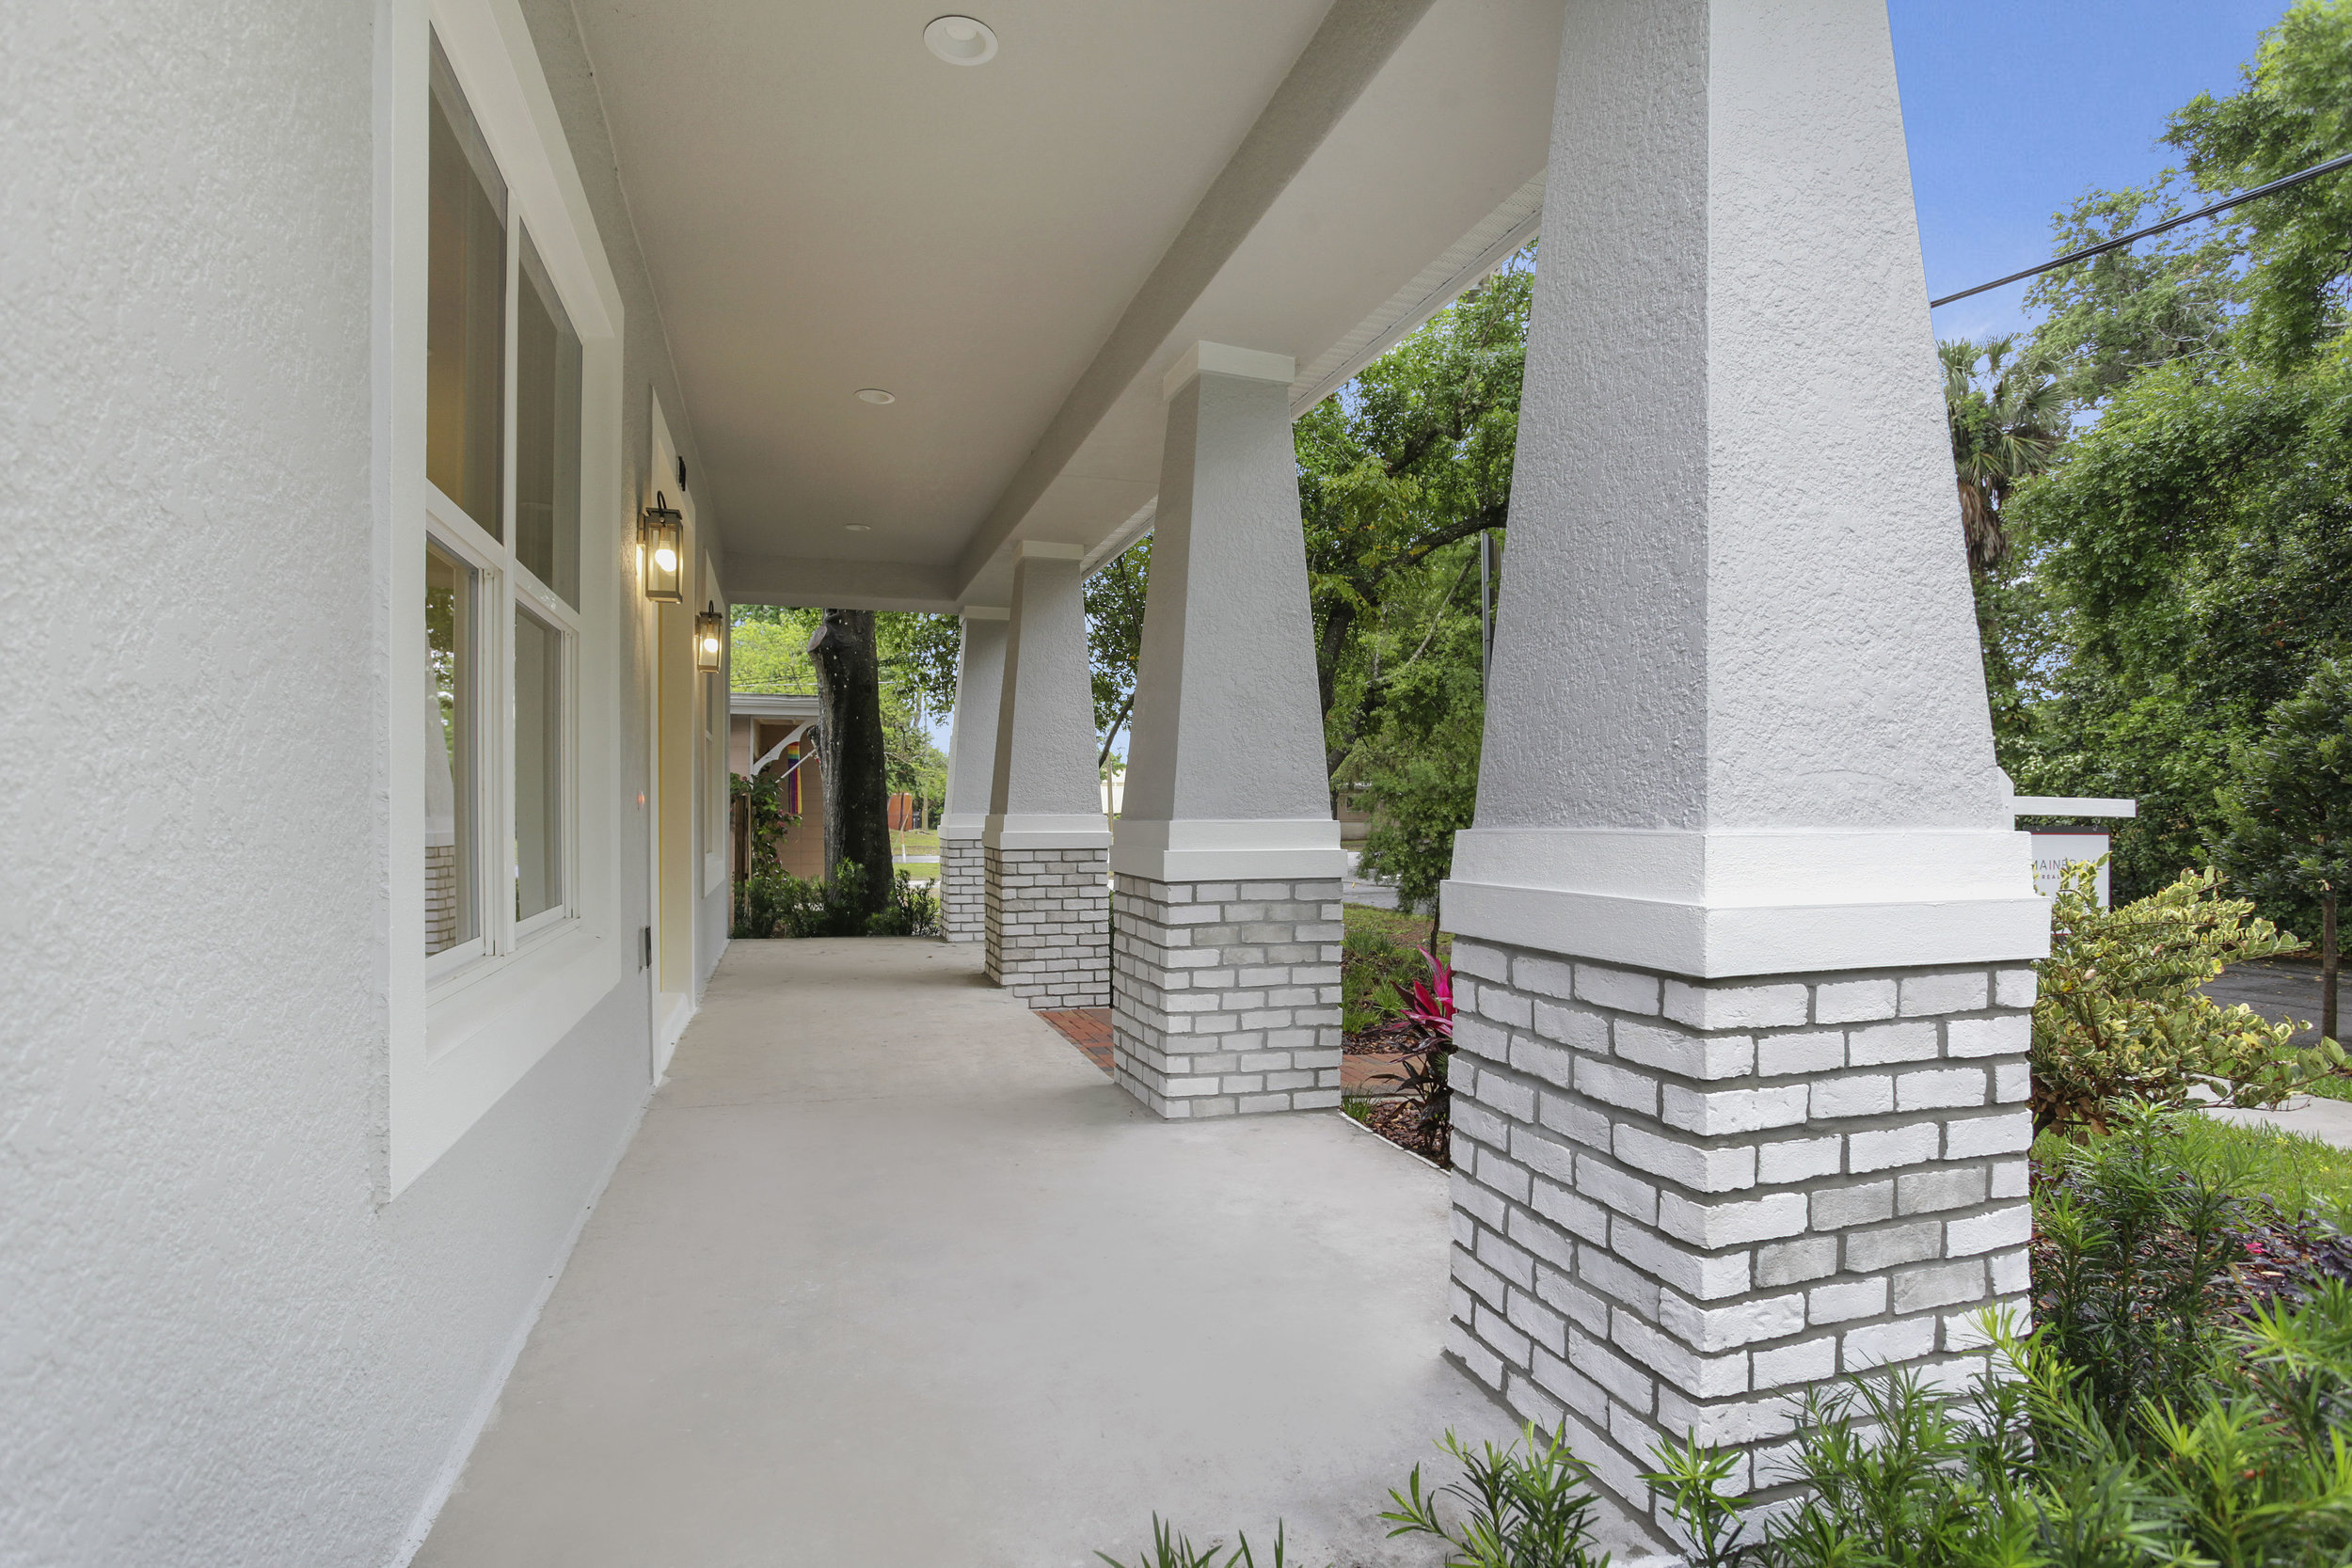 317 S Brown Ave, Orlando_IMG_0366.jpg